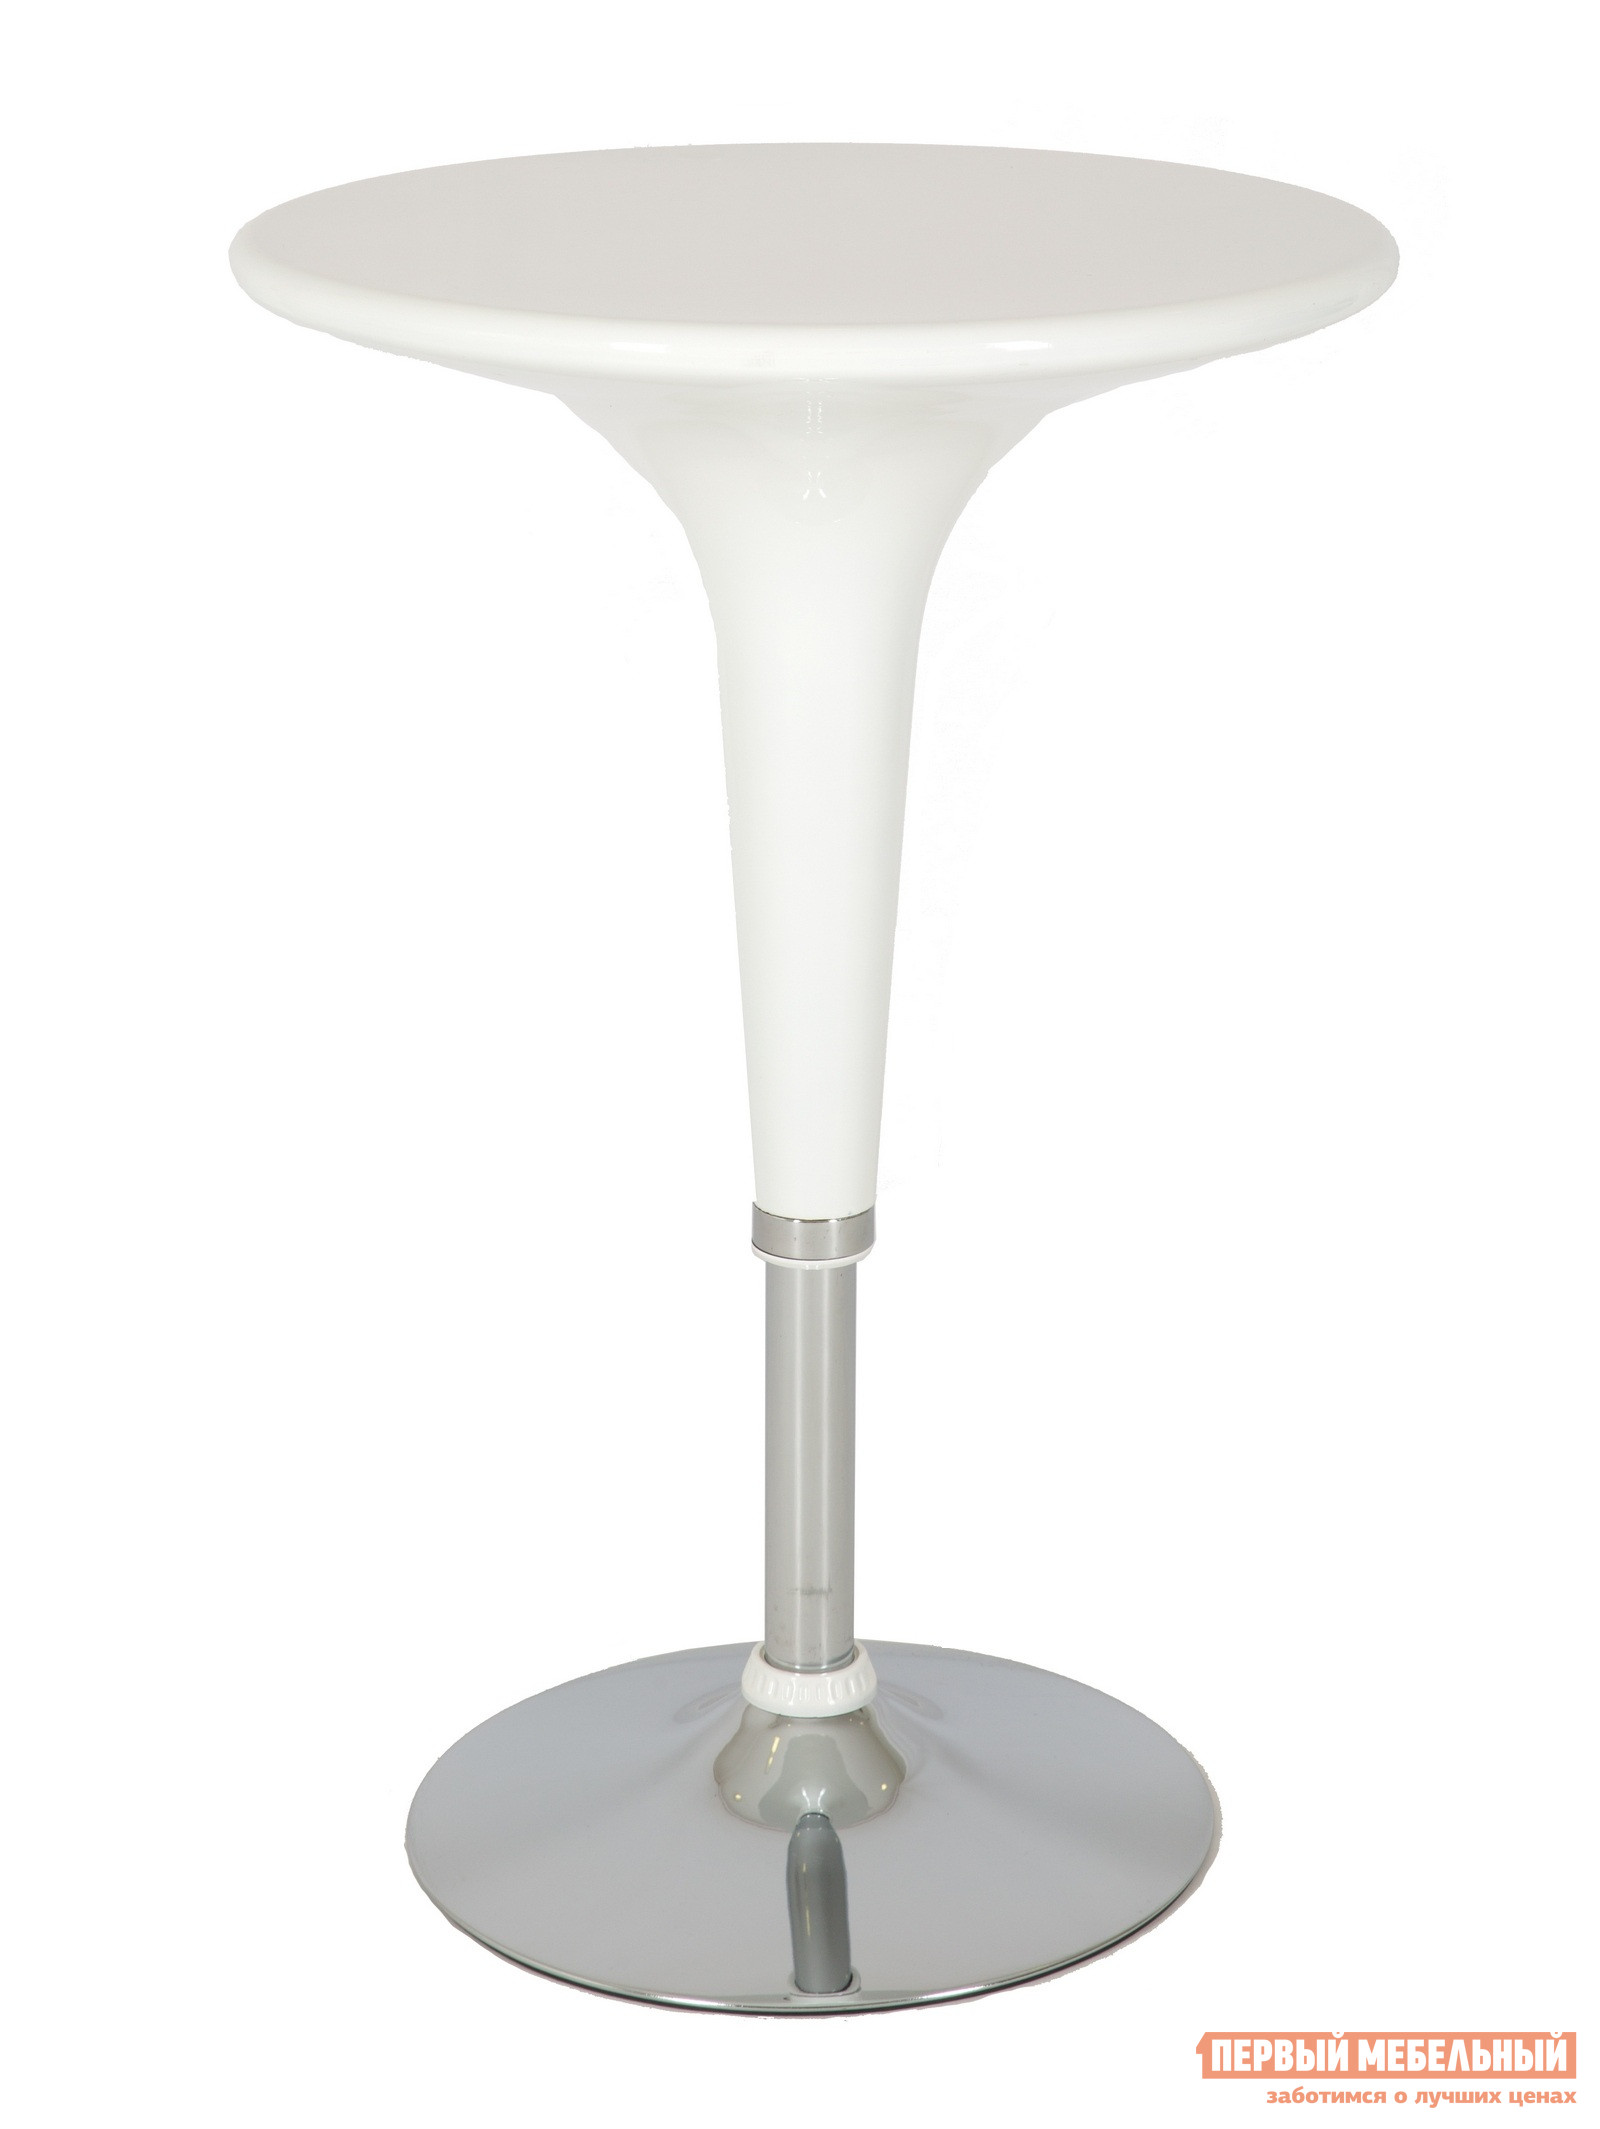 Барный стол Бентли Трейд A801 WHITE